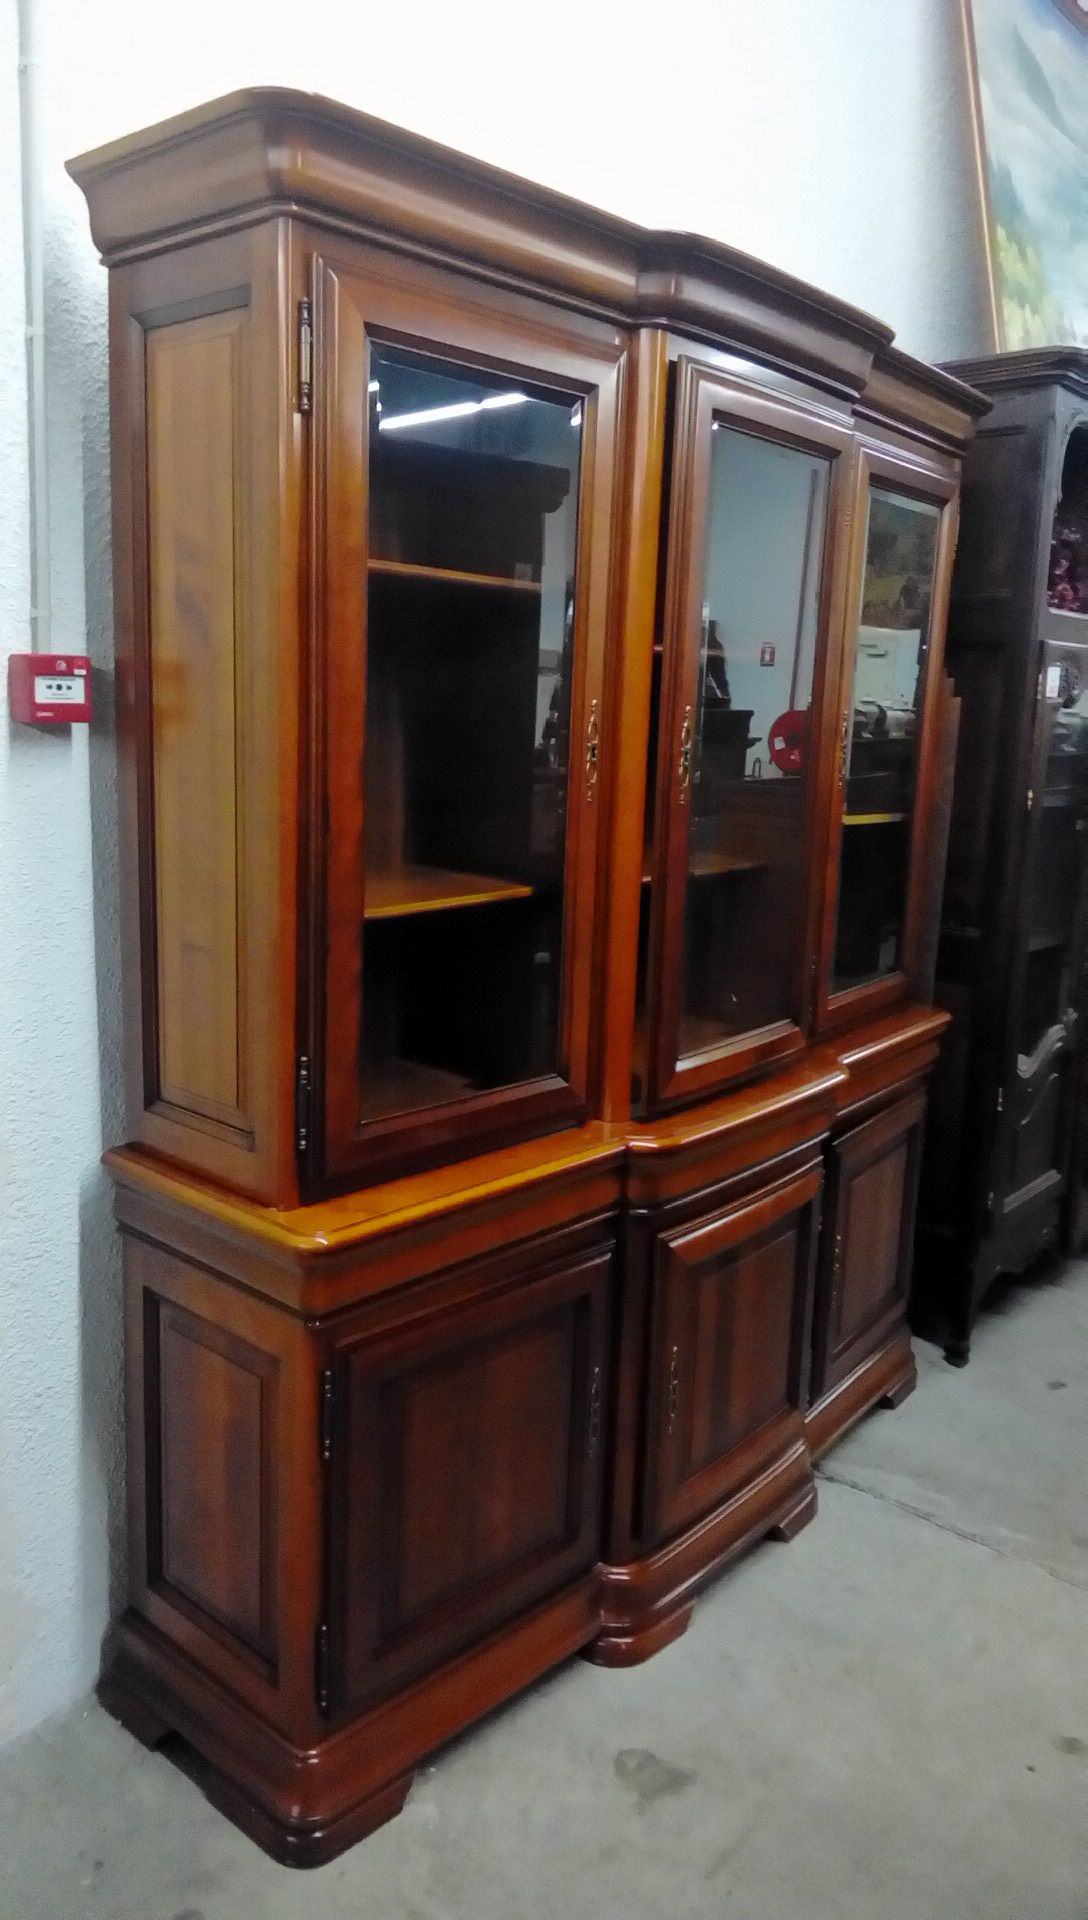 biblioth que style lp occasion troc nancy. Black Bedroom Furniture Sets. Home Design Ideas